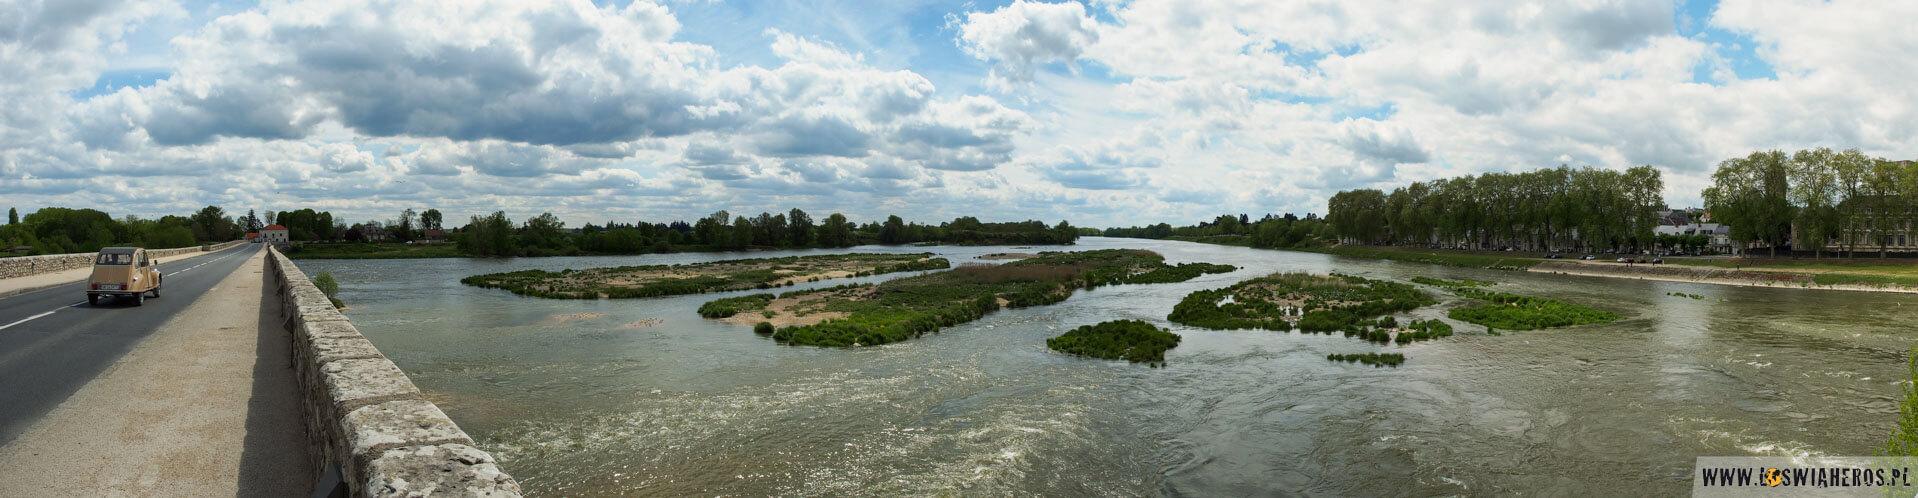 Rezerwat przyrody Rives de Beaugency